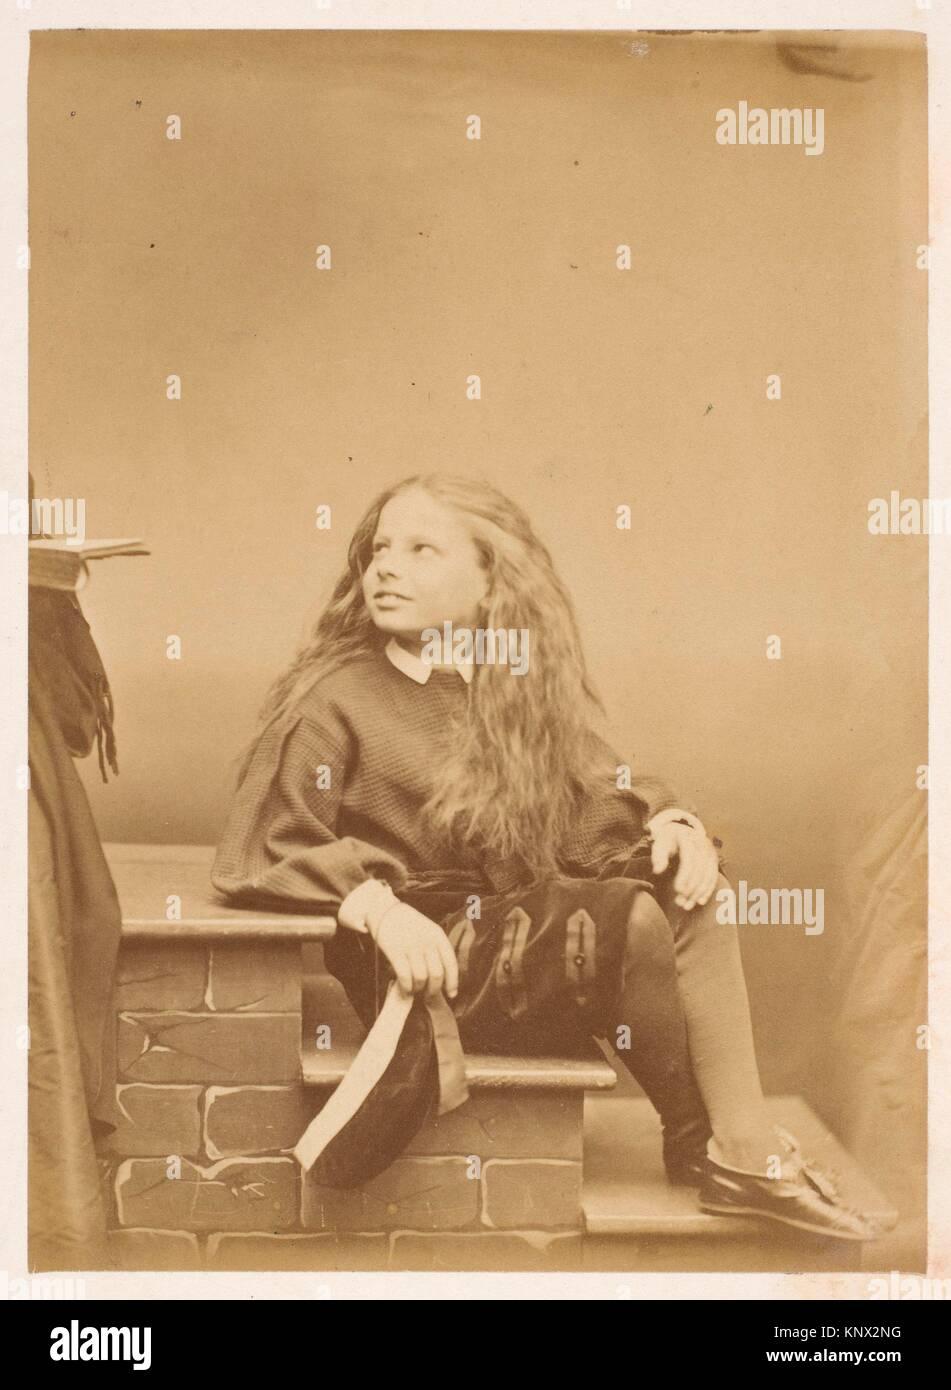 Le montagnard. Artist: Pierre-Louis Pierson (French, 1822-1913); Date: 1860s; Medium: Albumen silver print from Stock Photo